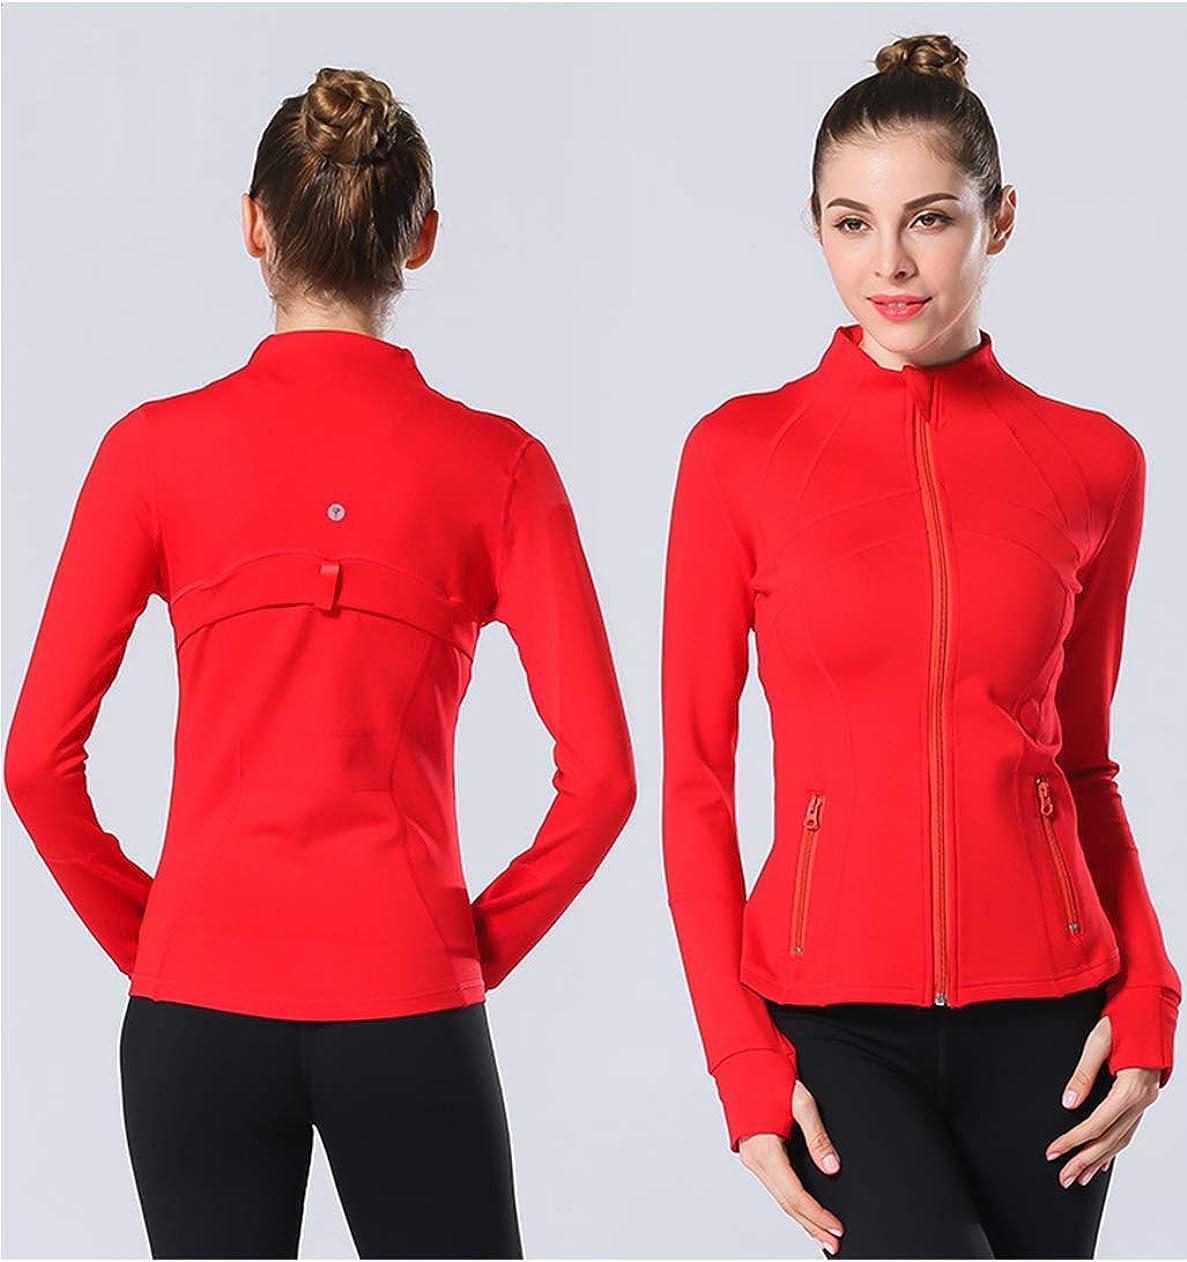 UDIY Women Running Yoga Slim UV Protect Sweatshirts with Two Side Pocket Jacket Coat